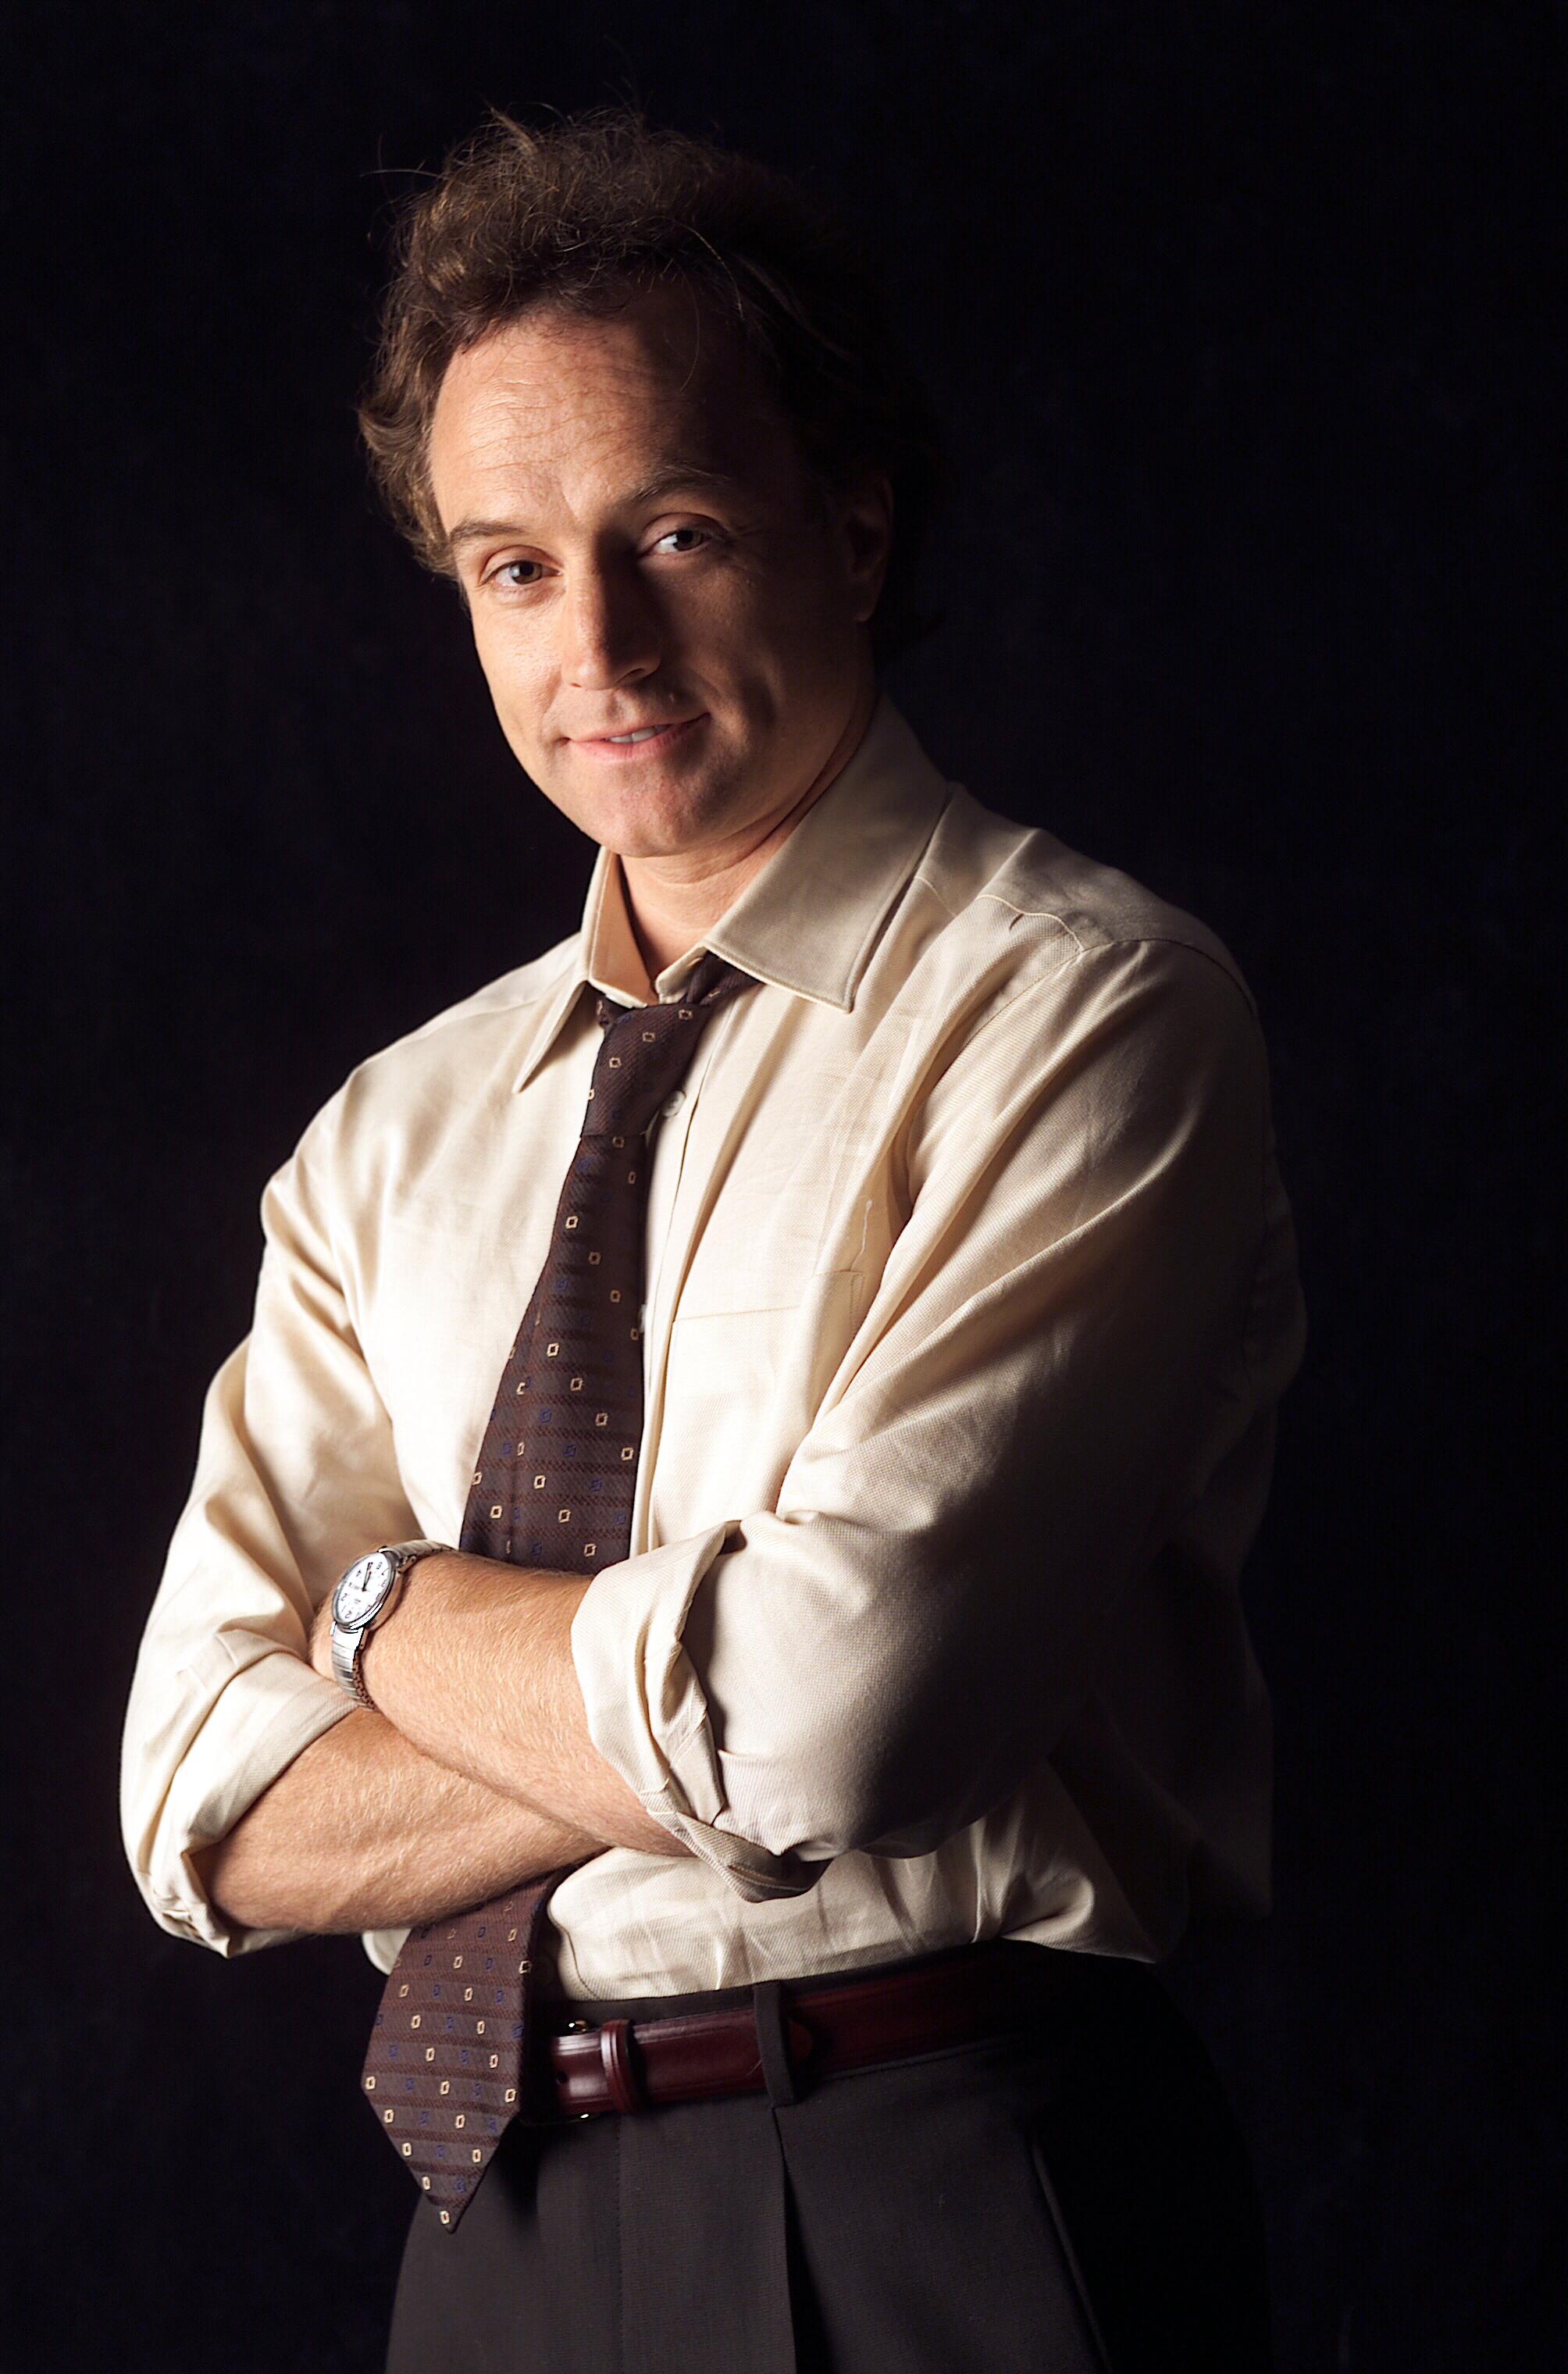 Josh Lyman